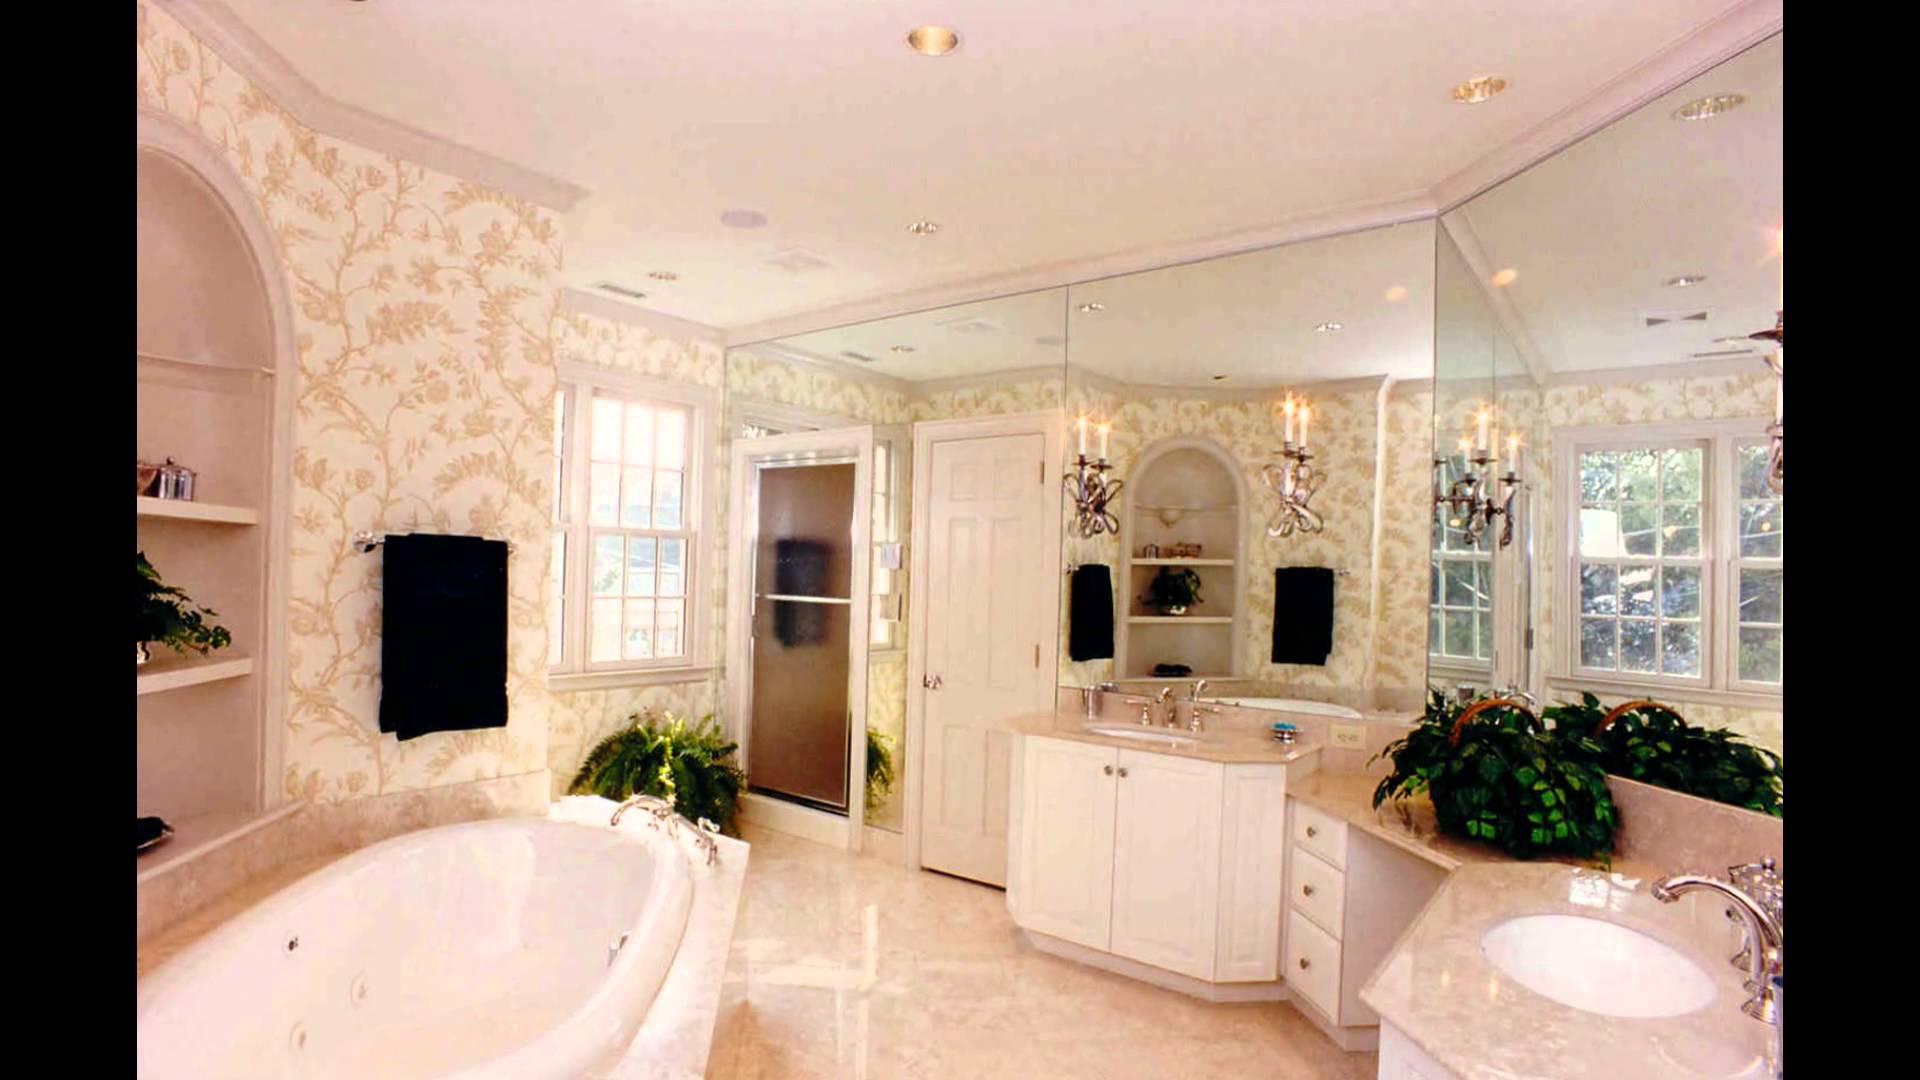 Master Bedroom Bathroom Designs Home Design Concept Ideas House Plans 140353